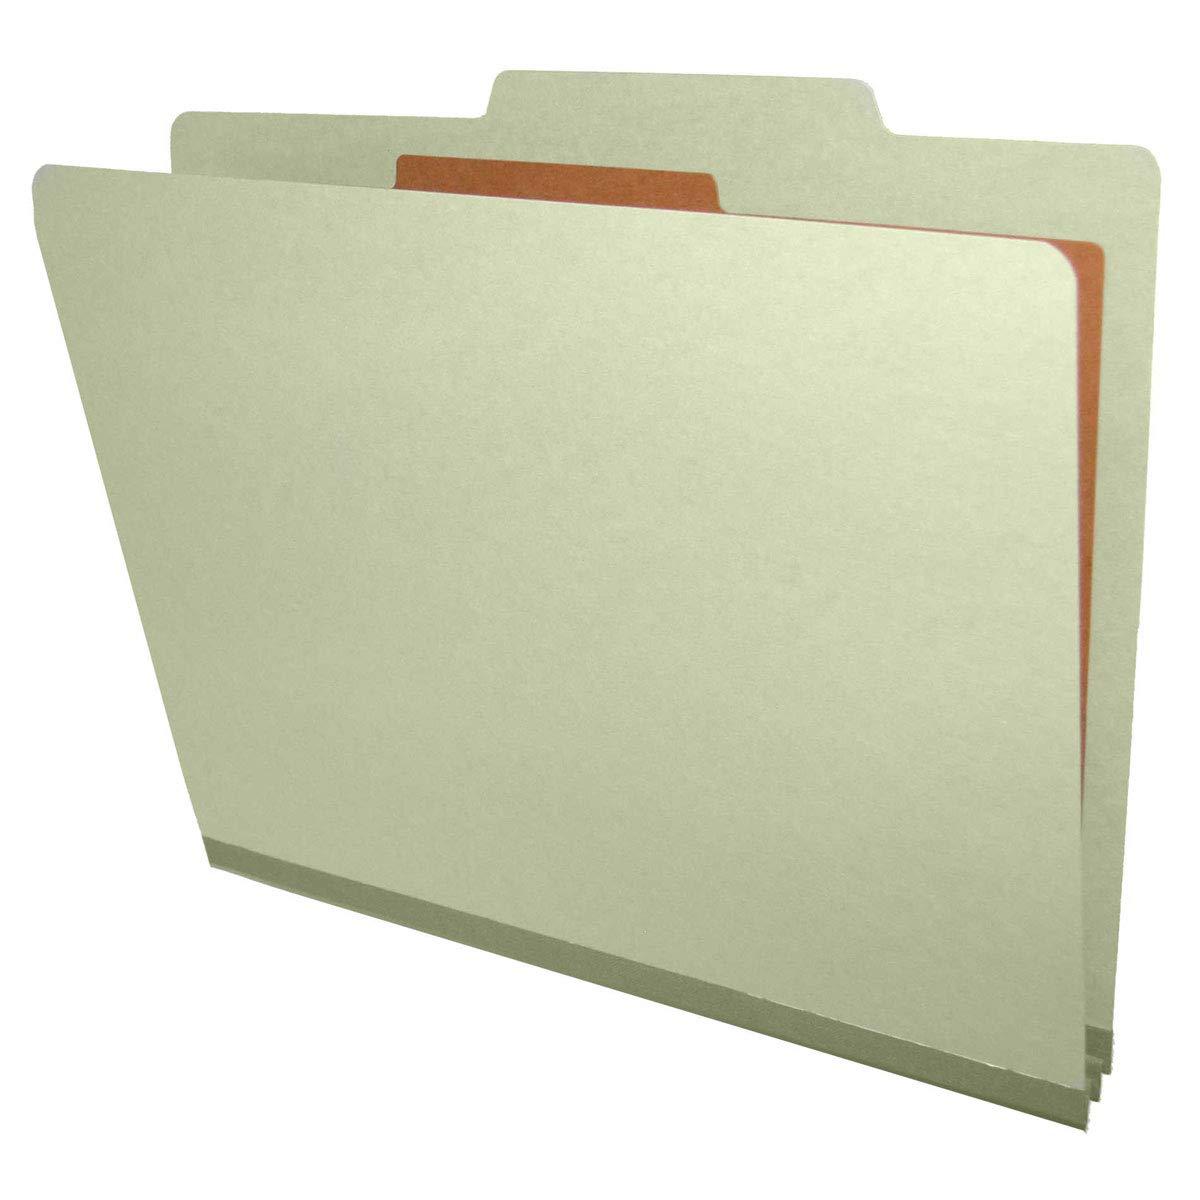 Top Tab 10 Pack 1 Divider Gray Green Pressboard Classification Folders Letter Size